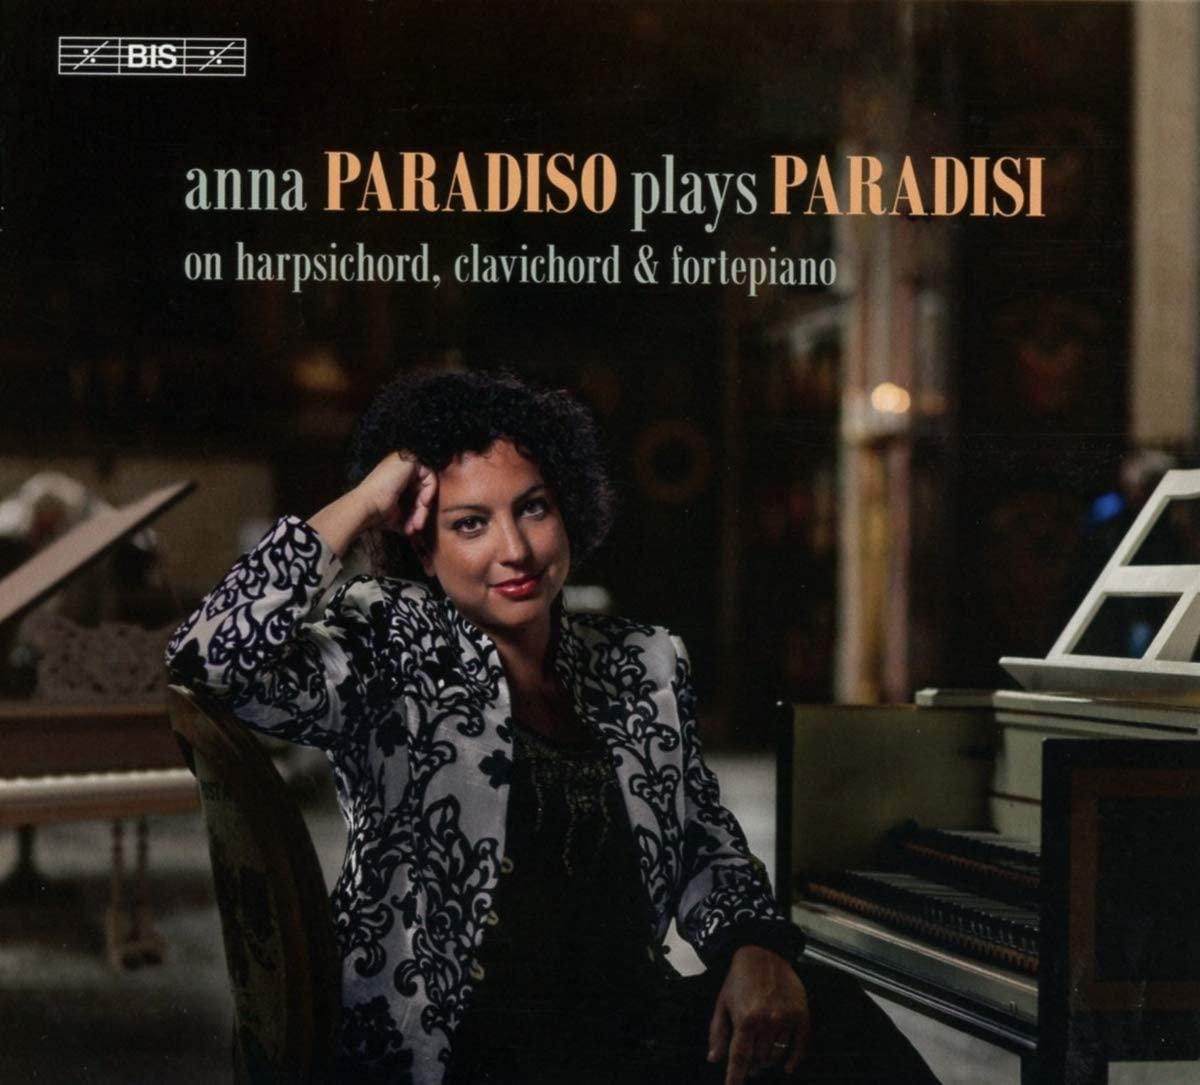 Review of Anna Paradiso plays Paradisi